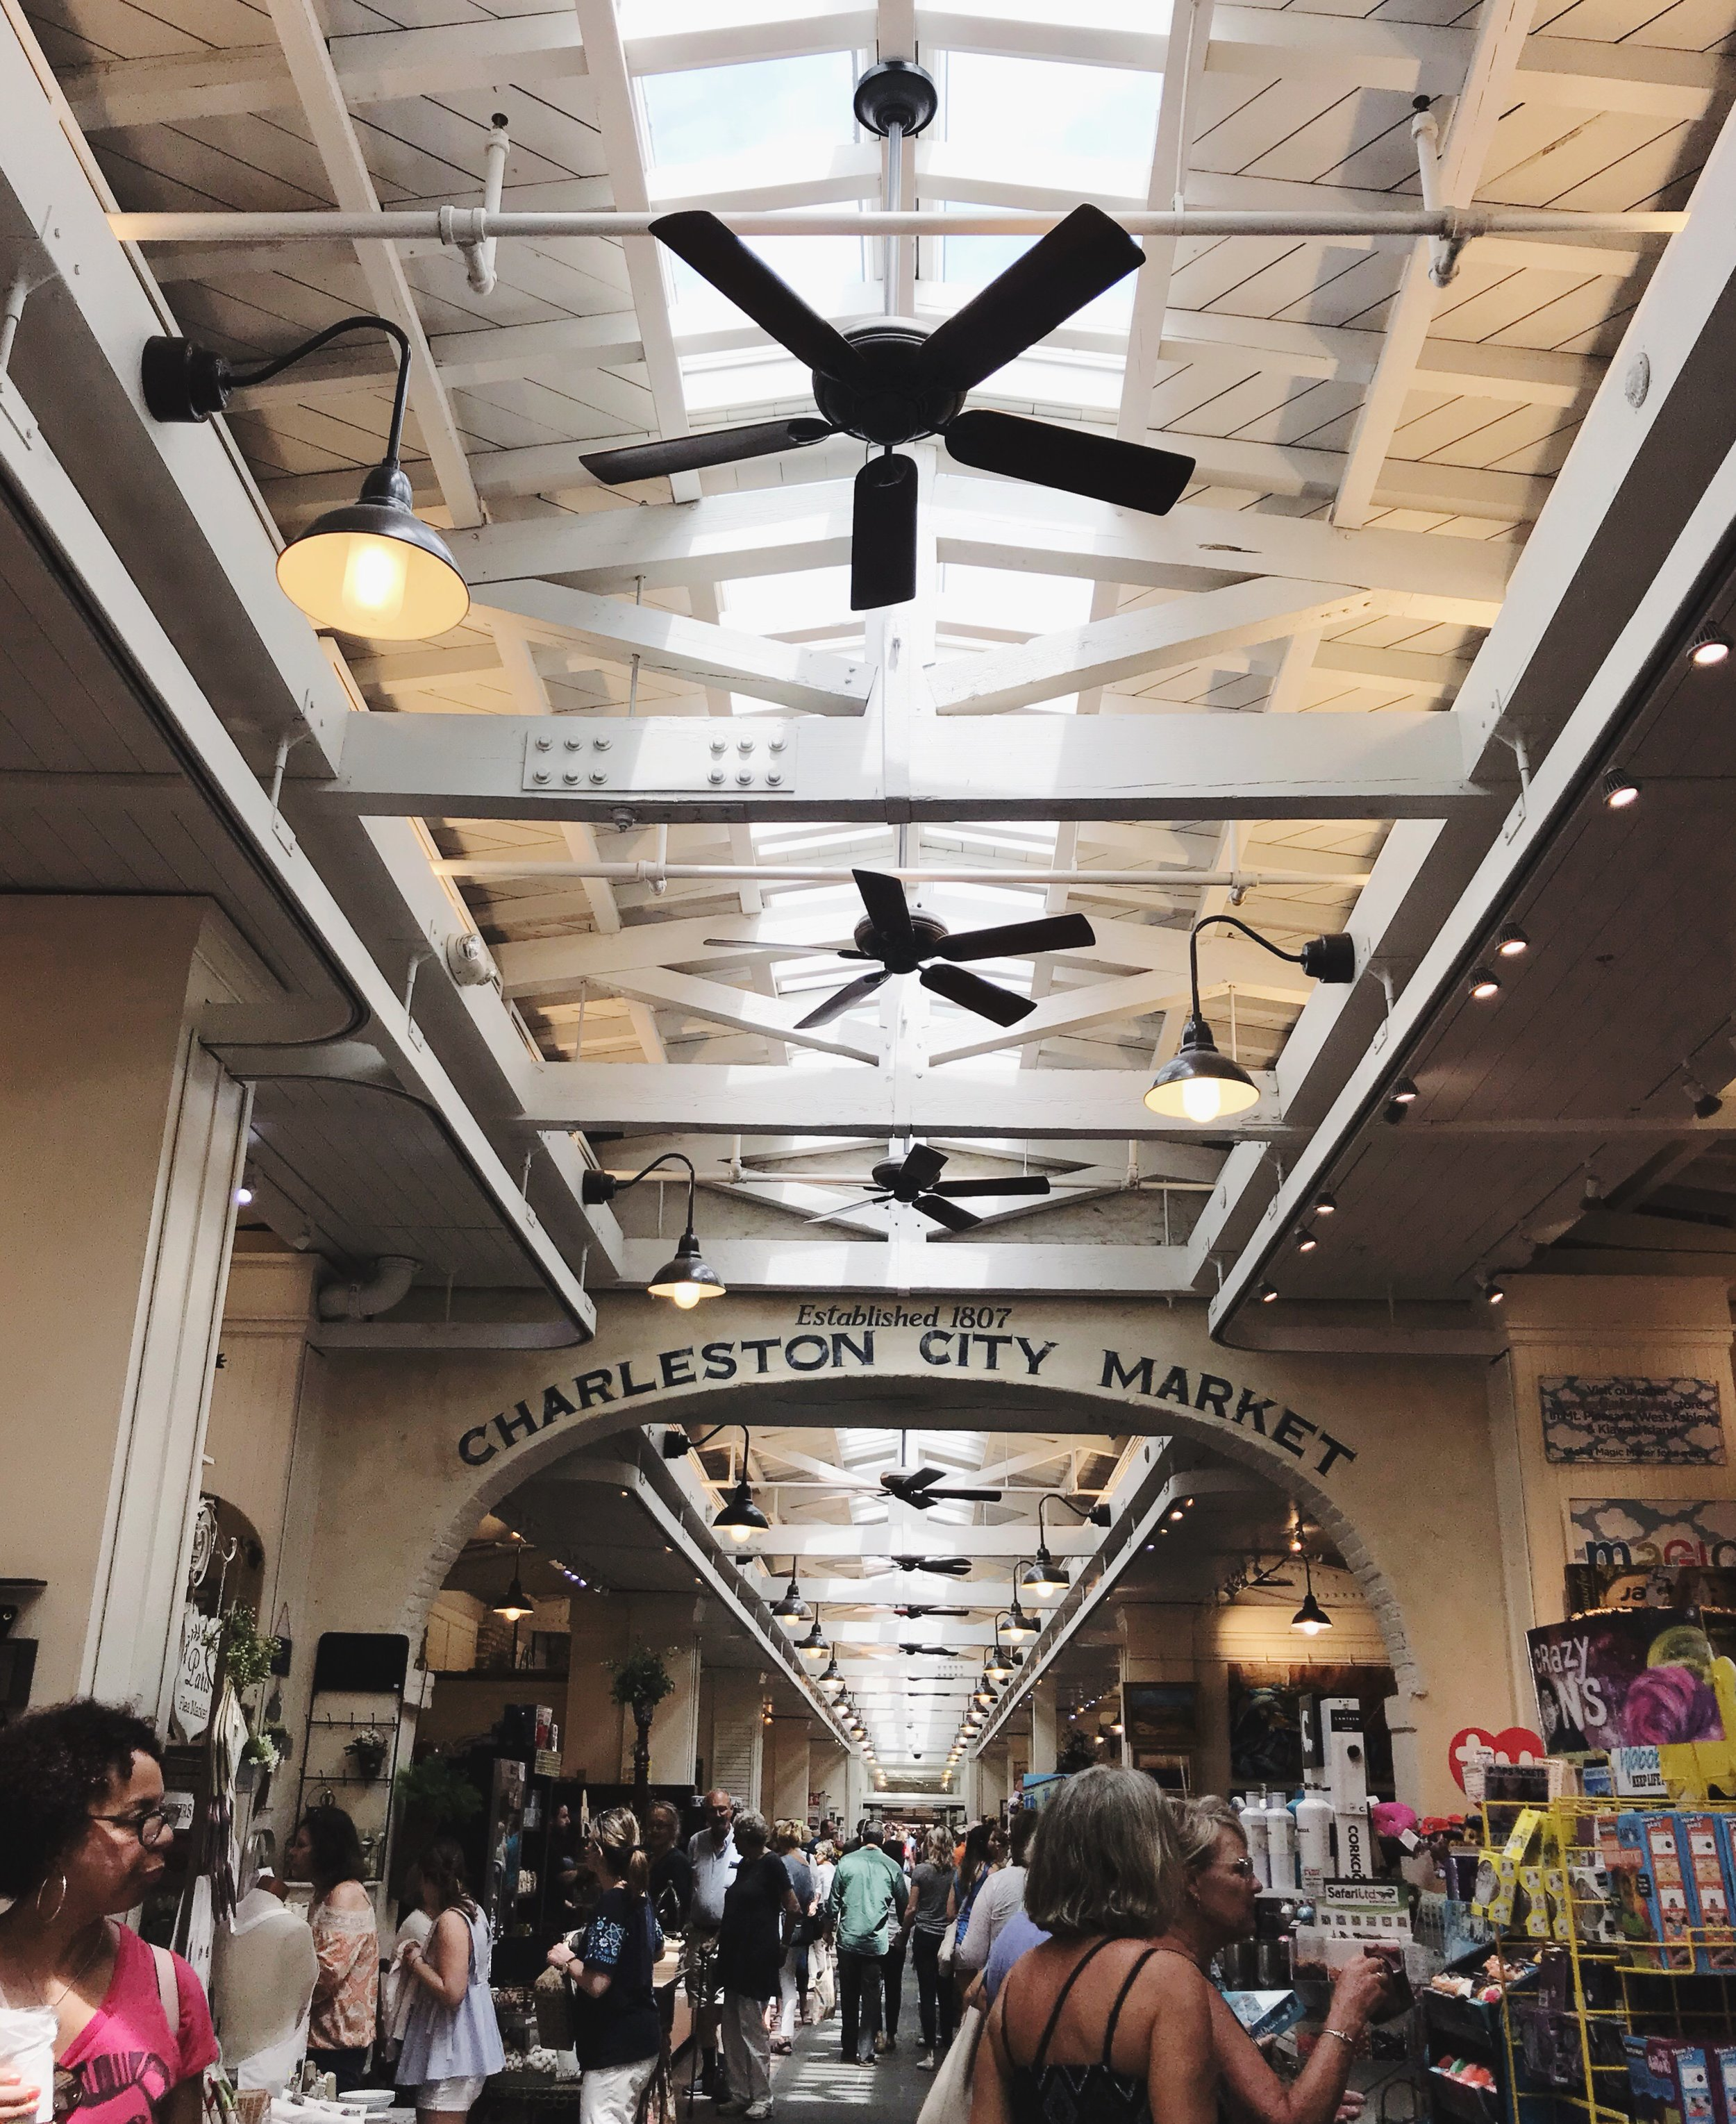 Inside the Historic Charleston City Market.